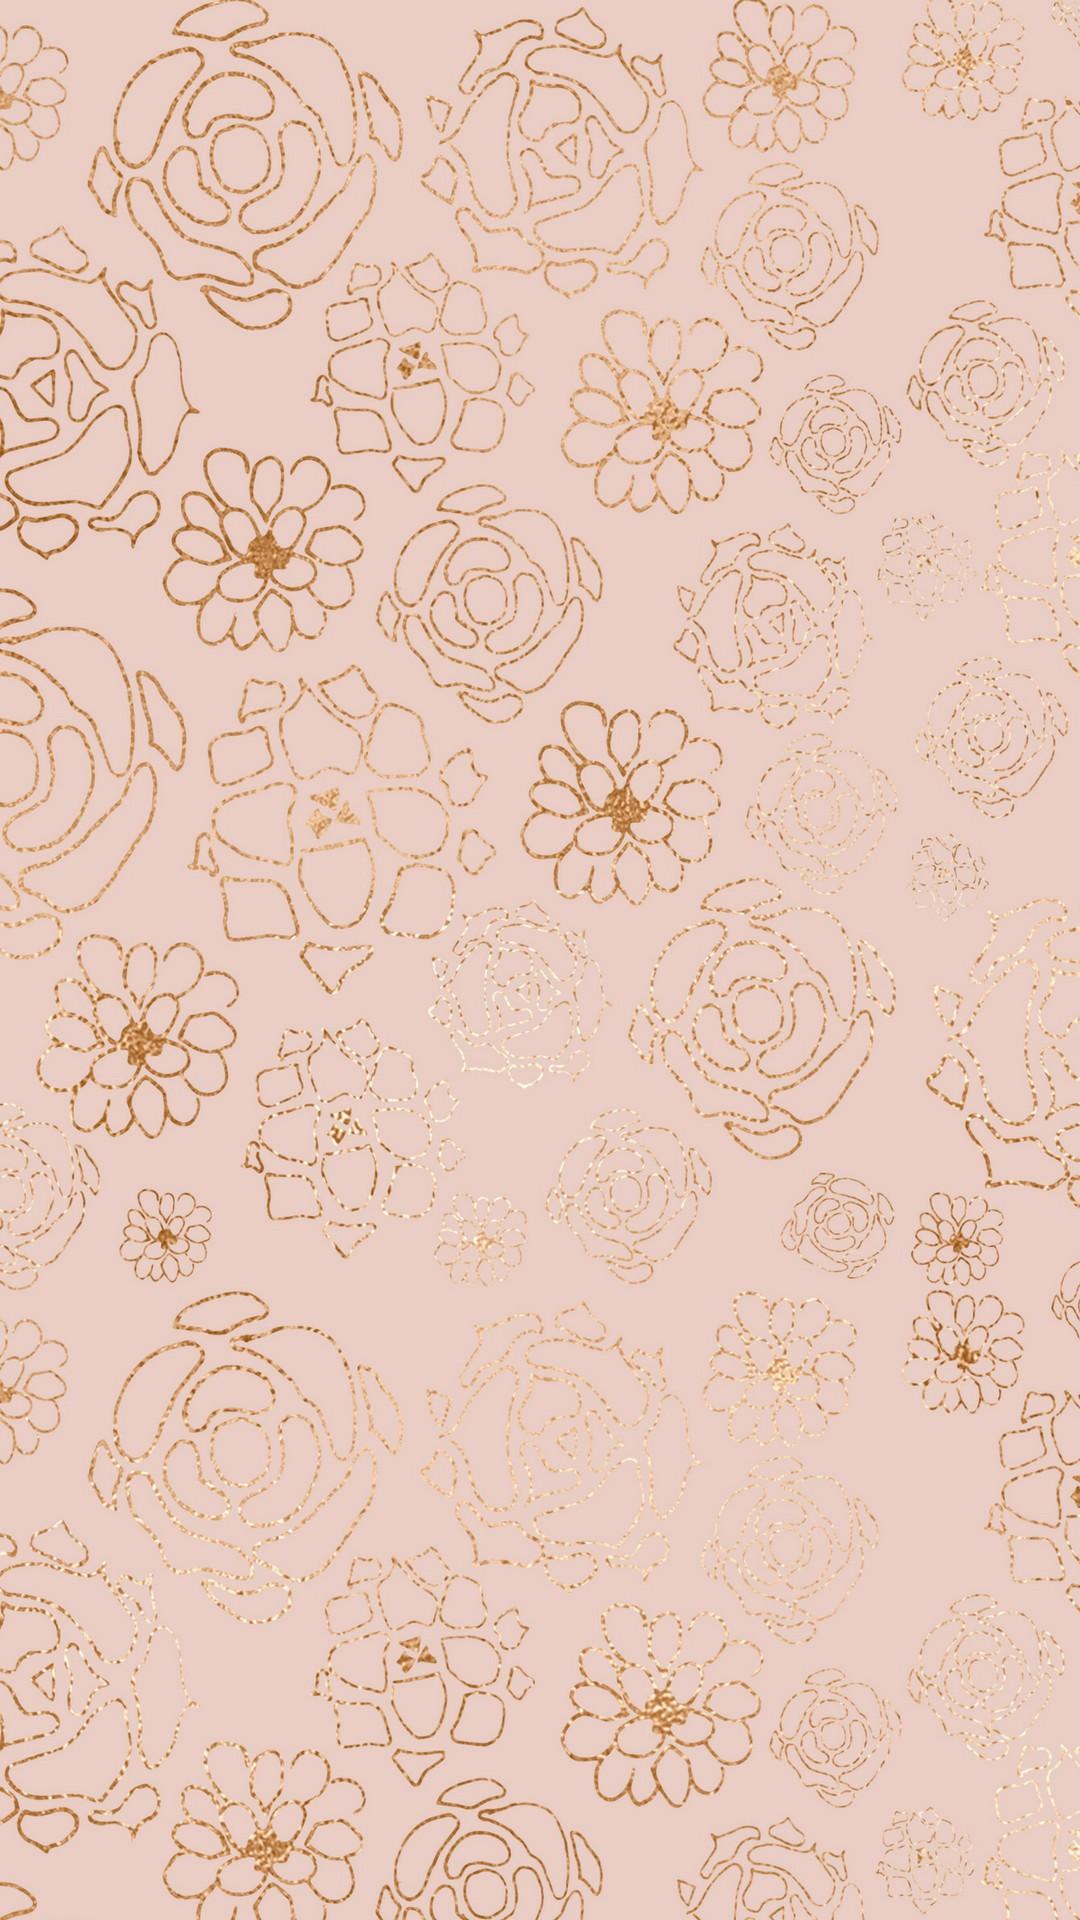 Iphone 5s Vintage Flower Wallpaper Iphone 287723 Hd Wallpaper Backgrounds Download